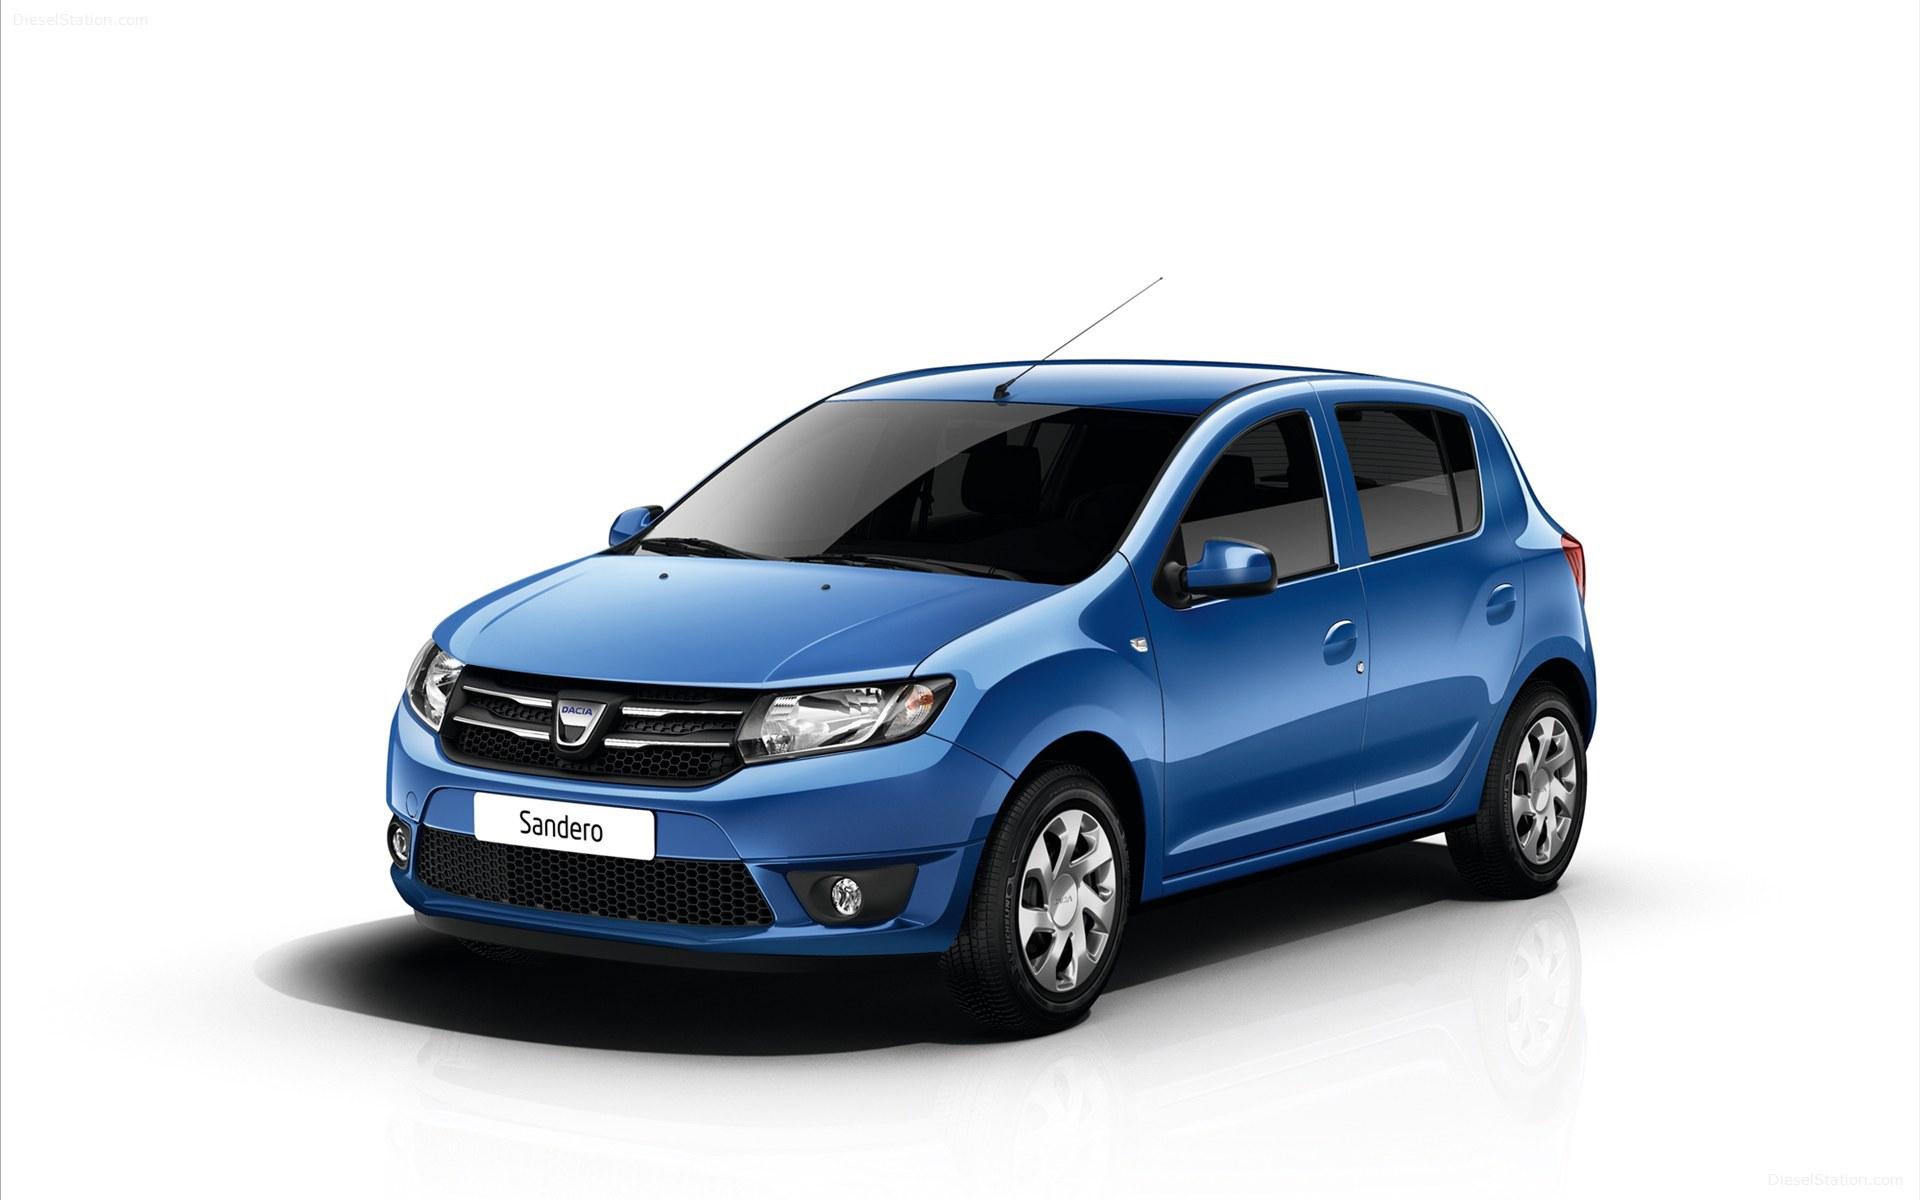 Auto___Renault__New_car_Renault_Sandero__062098_.jpg